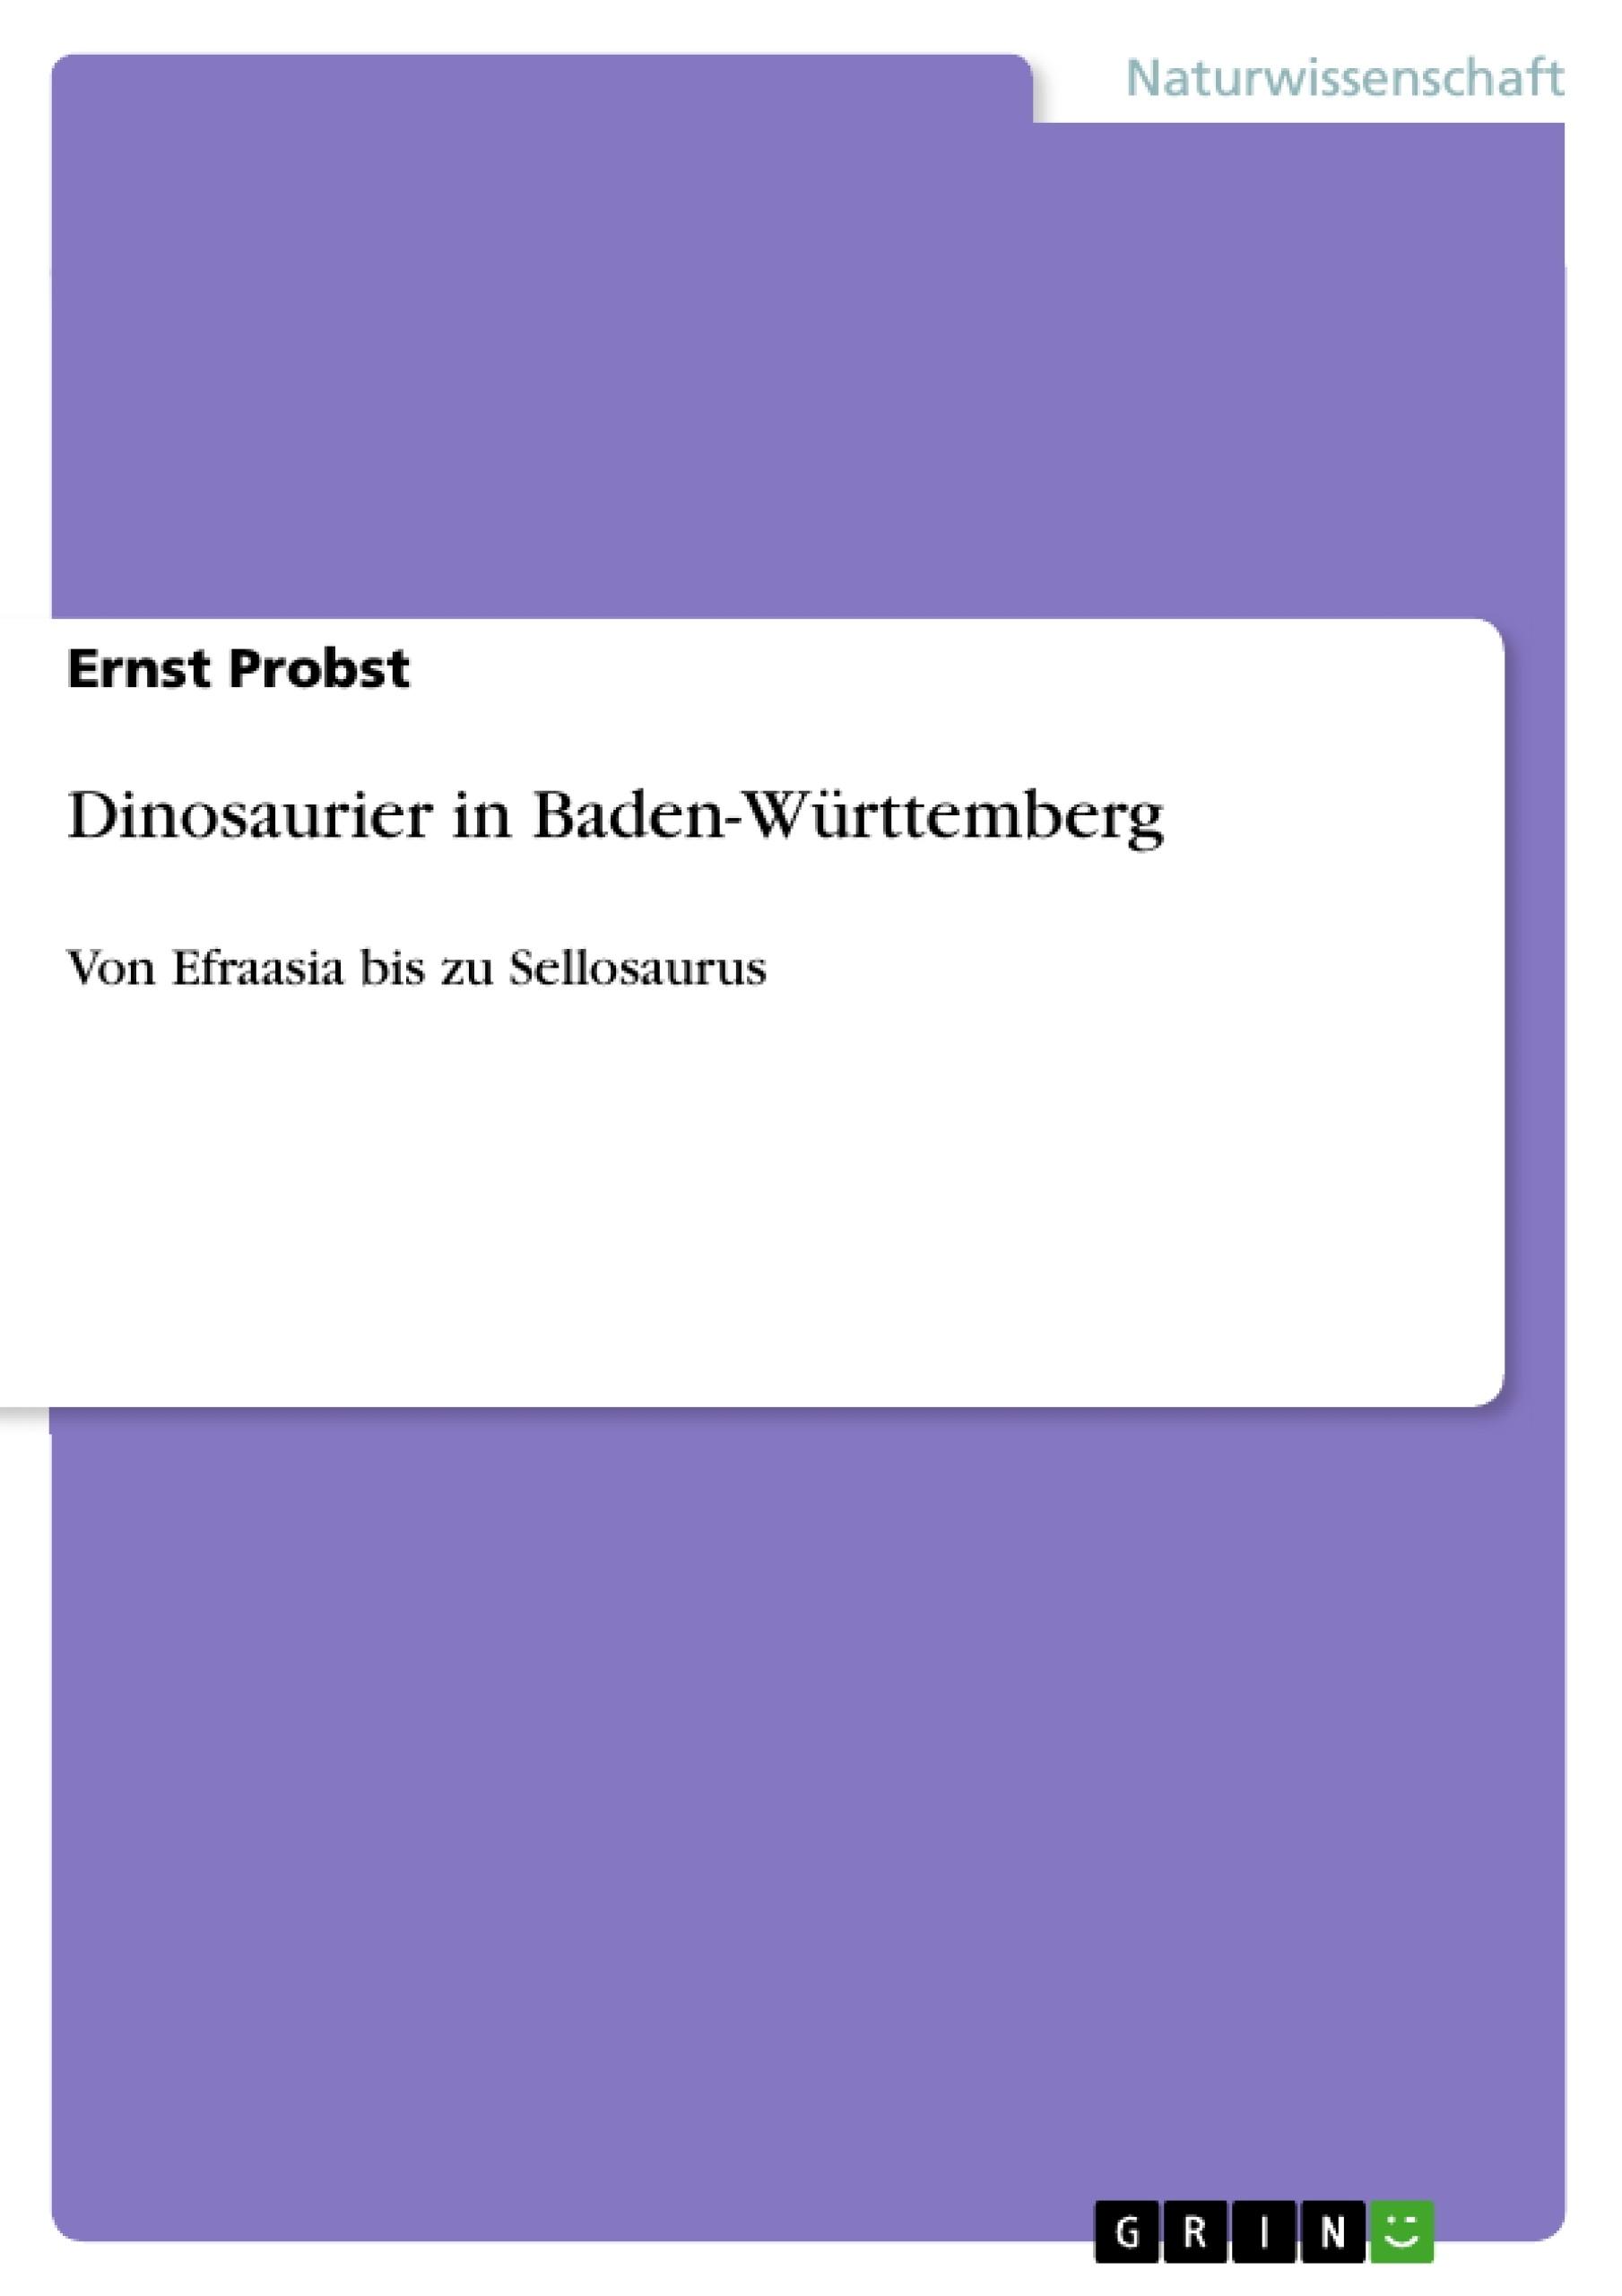 Titel: Dinosaurier in Baden-Württemberg